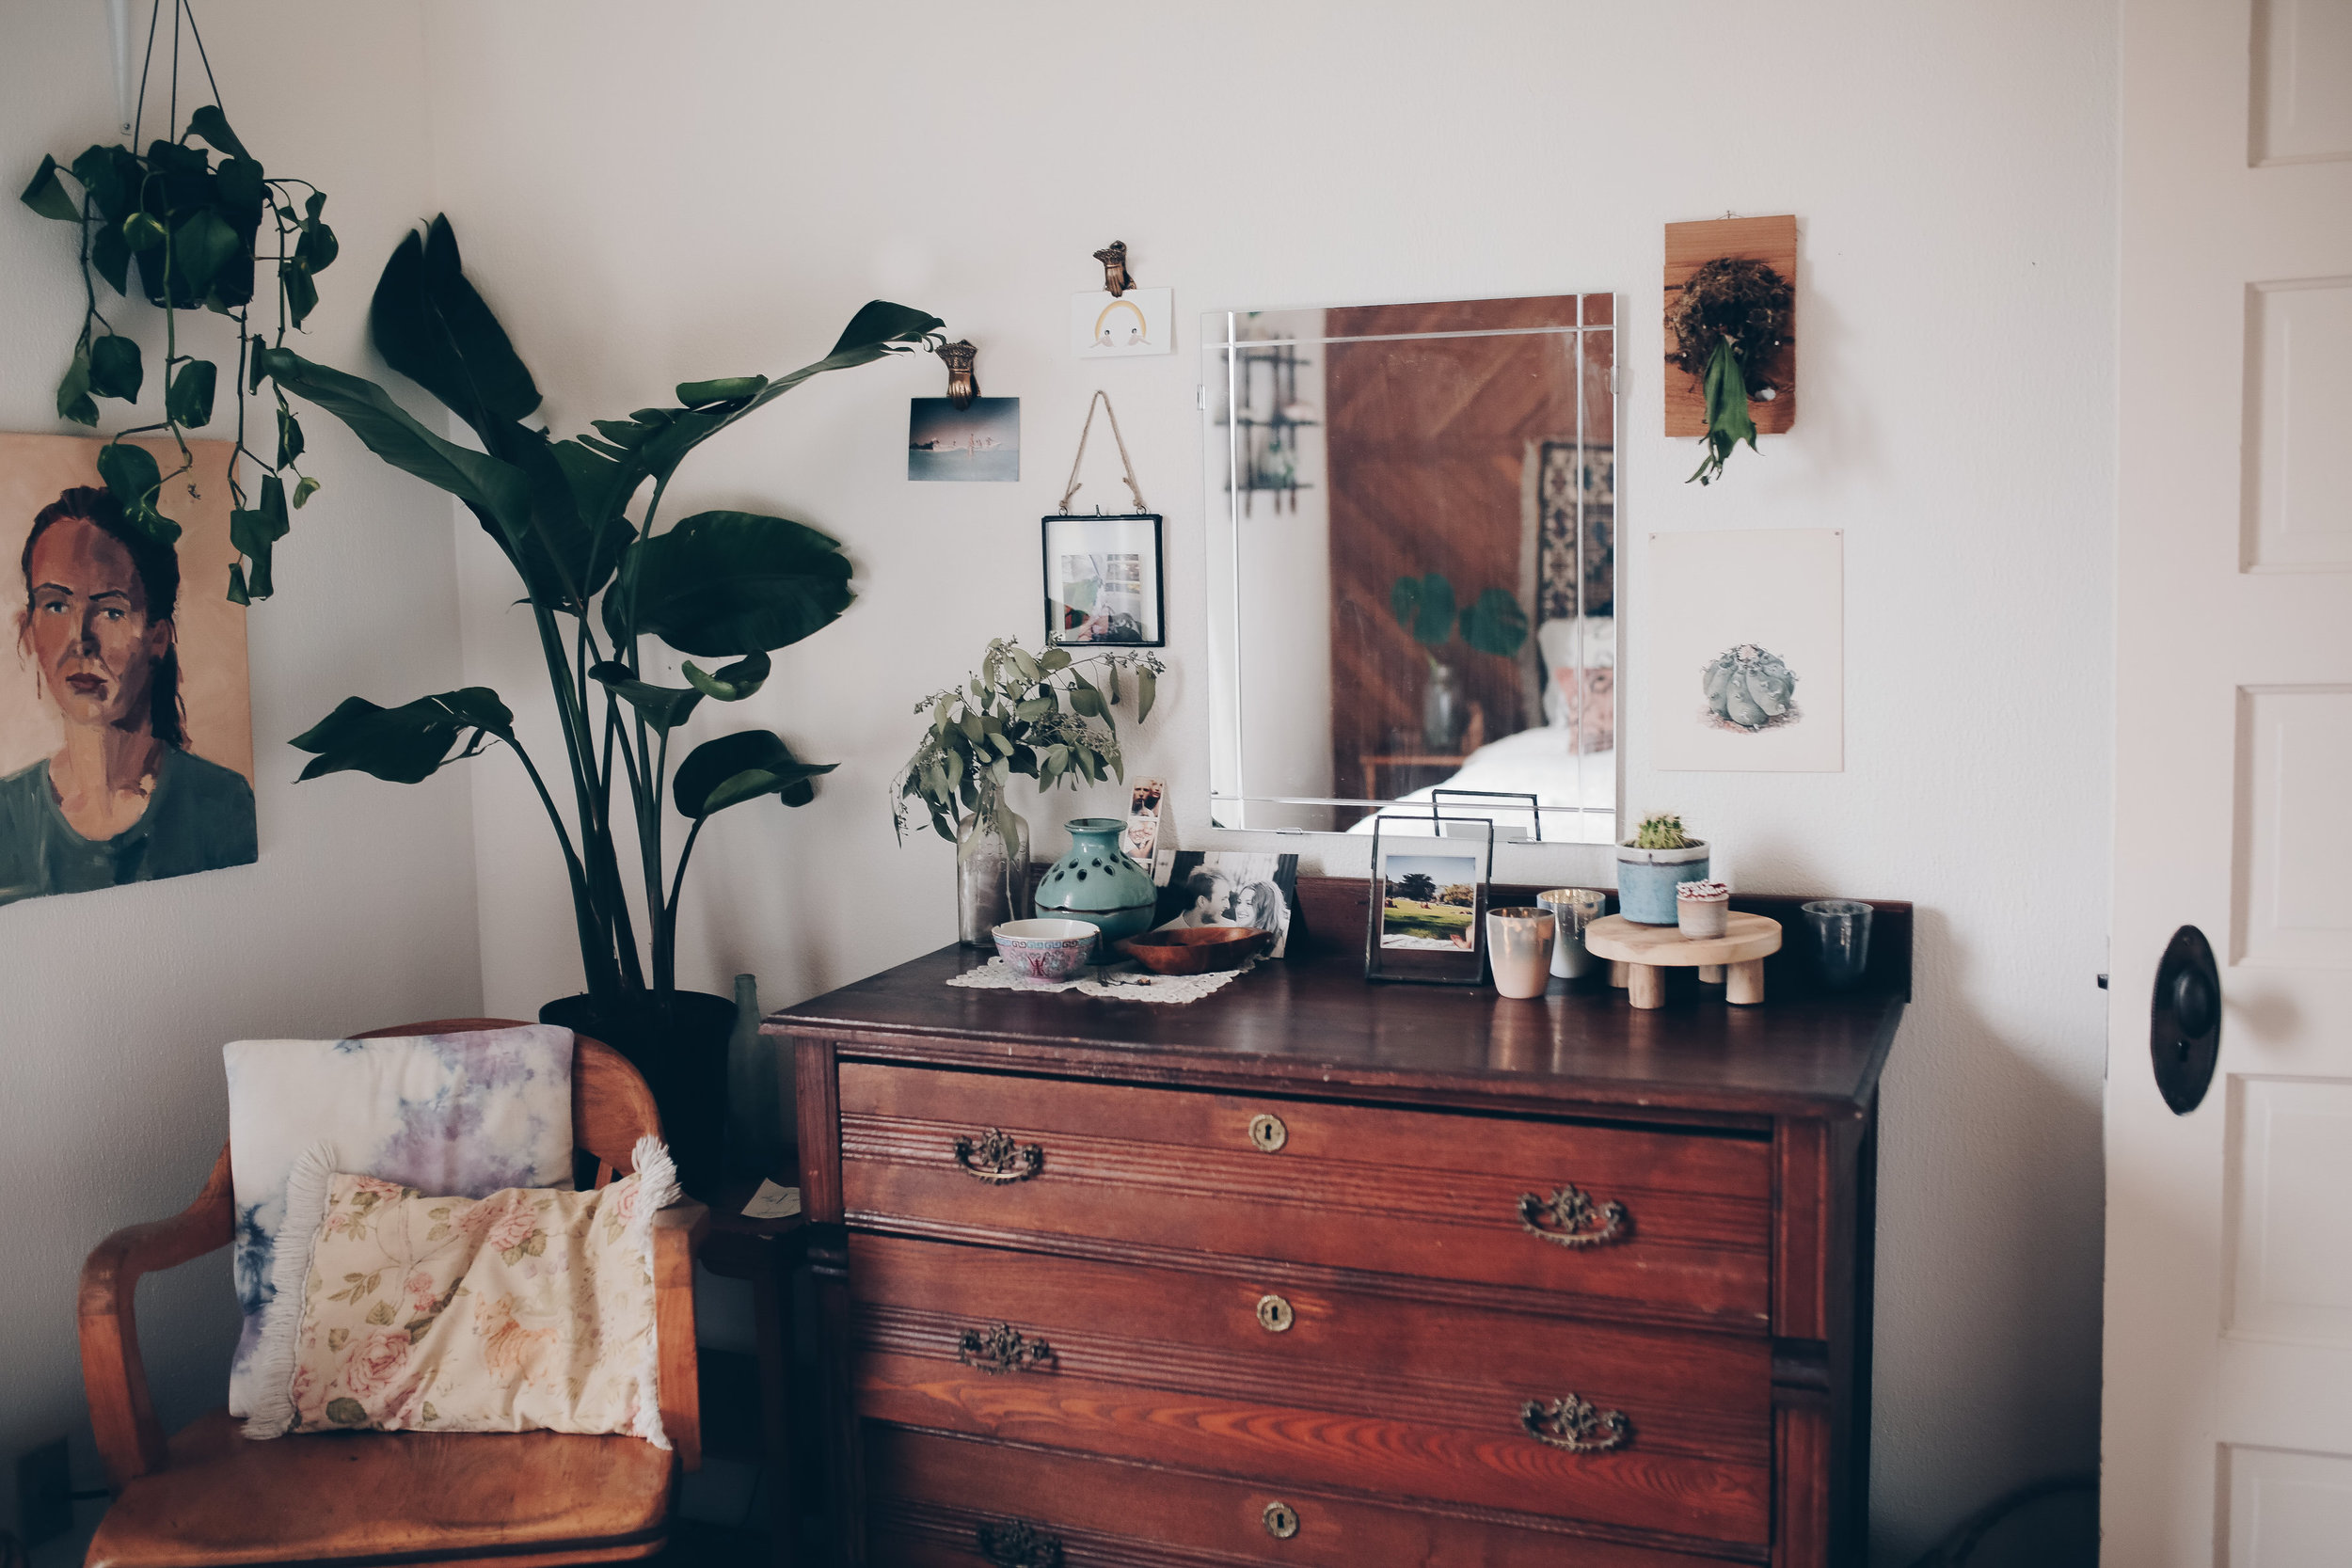 modern bohemian bedroom decor from foragedhome.com